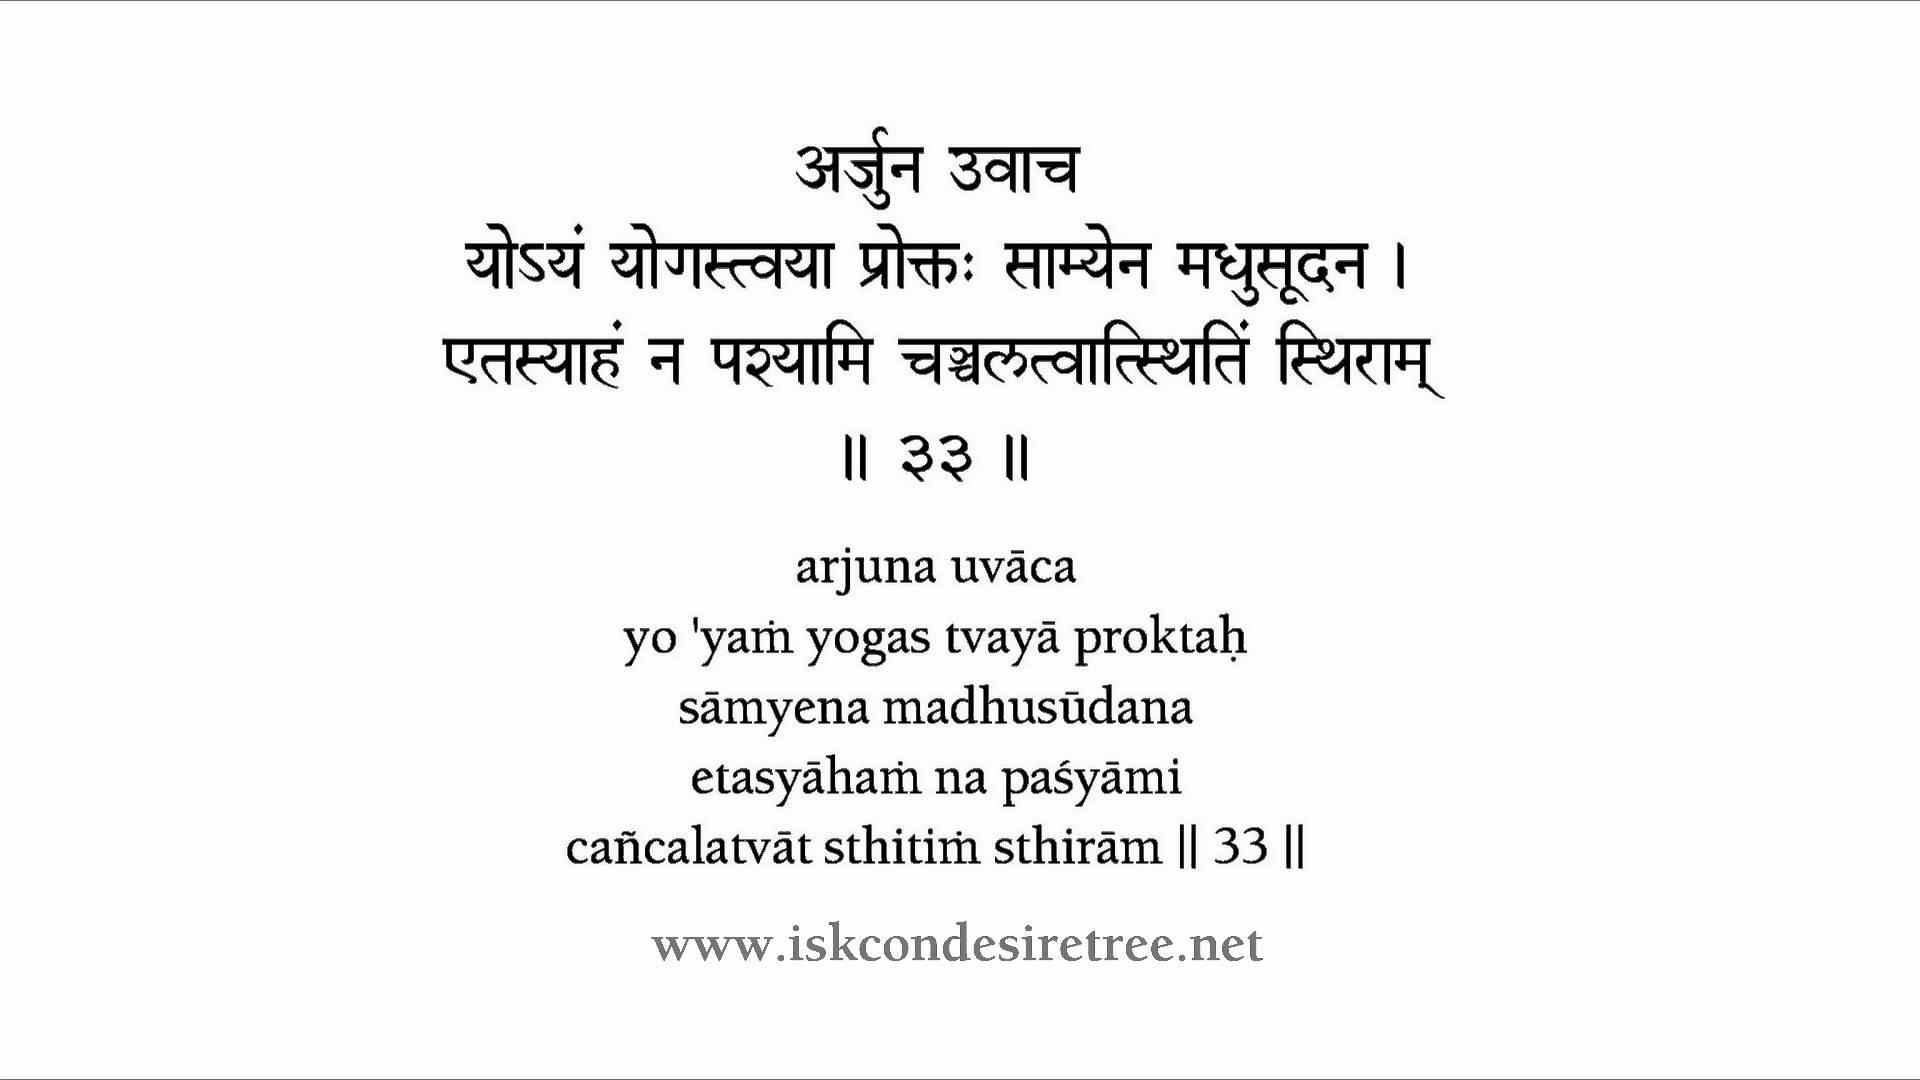 Bhagavad Gita Quotes In Sanskrit >> Hasshe.Com